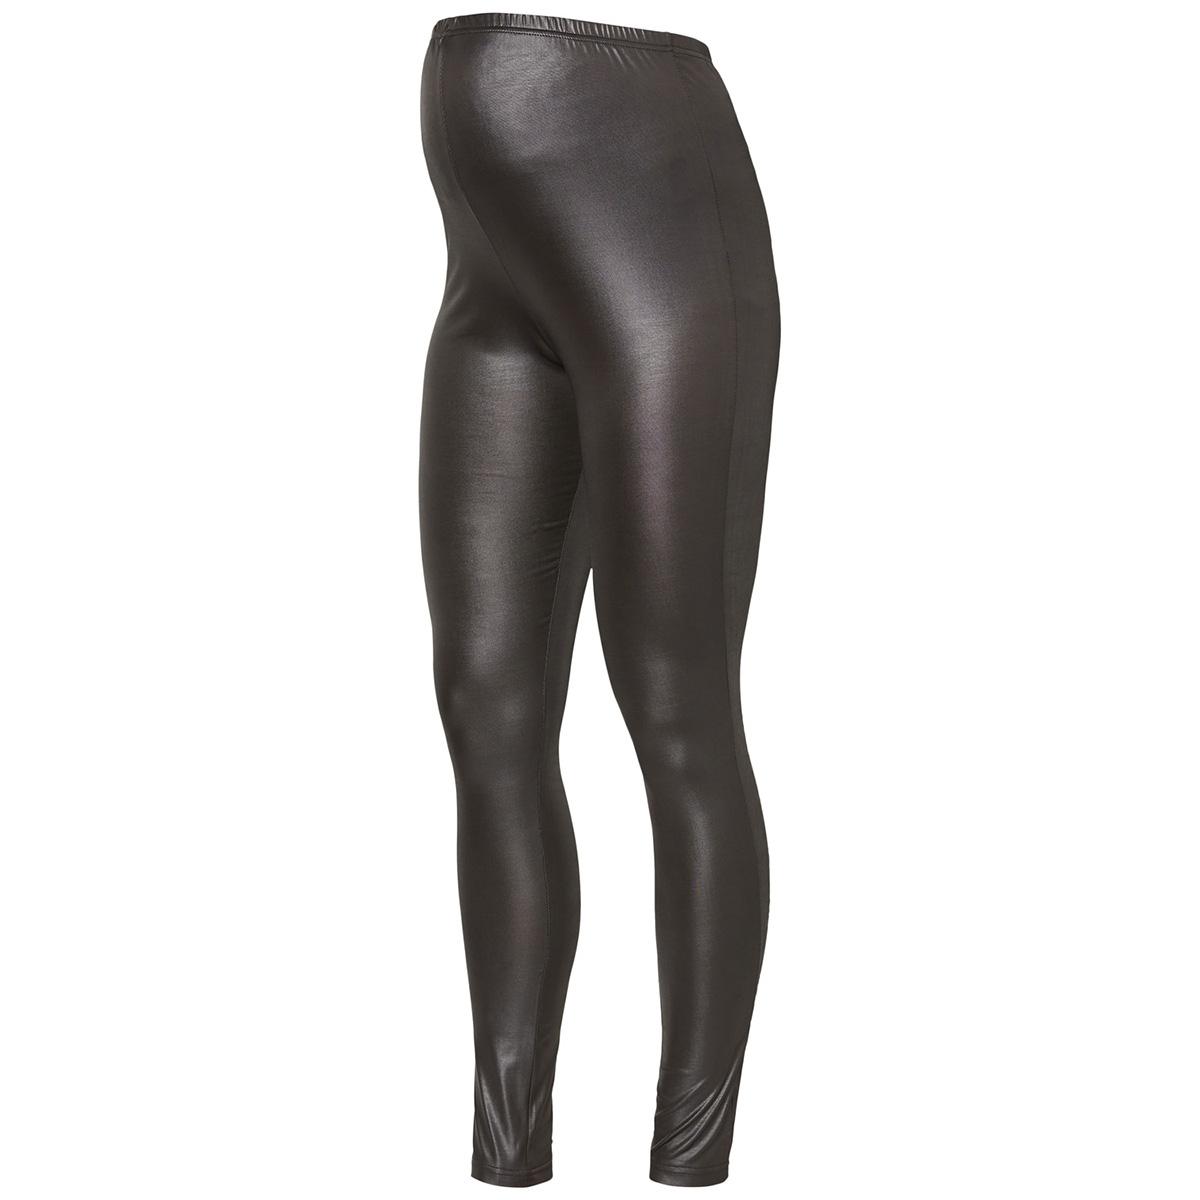 mlnewtessa jersey hw leggings noos 20009158 mama-licious positie broek black